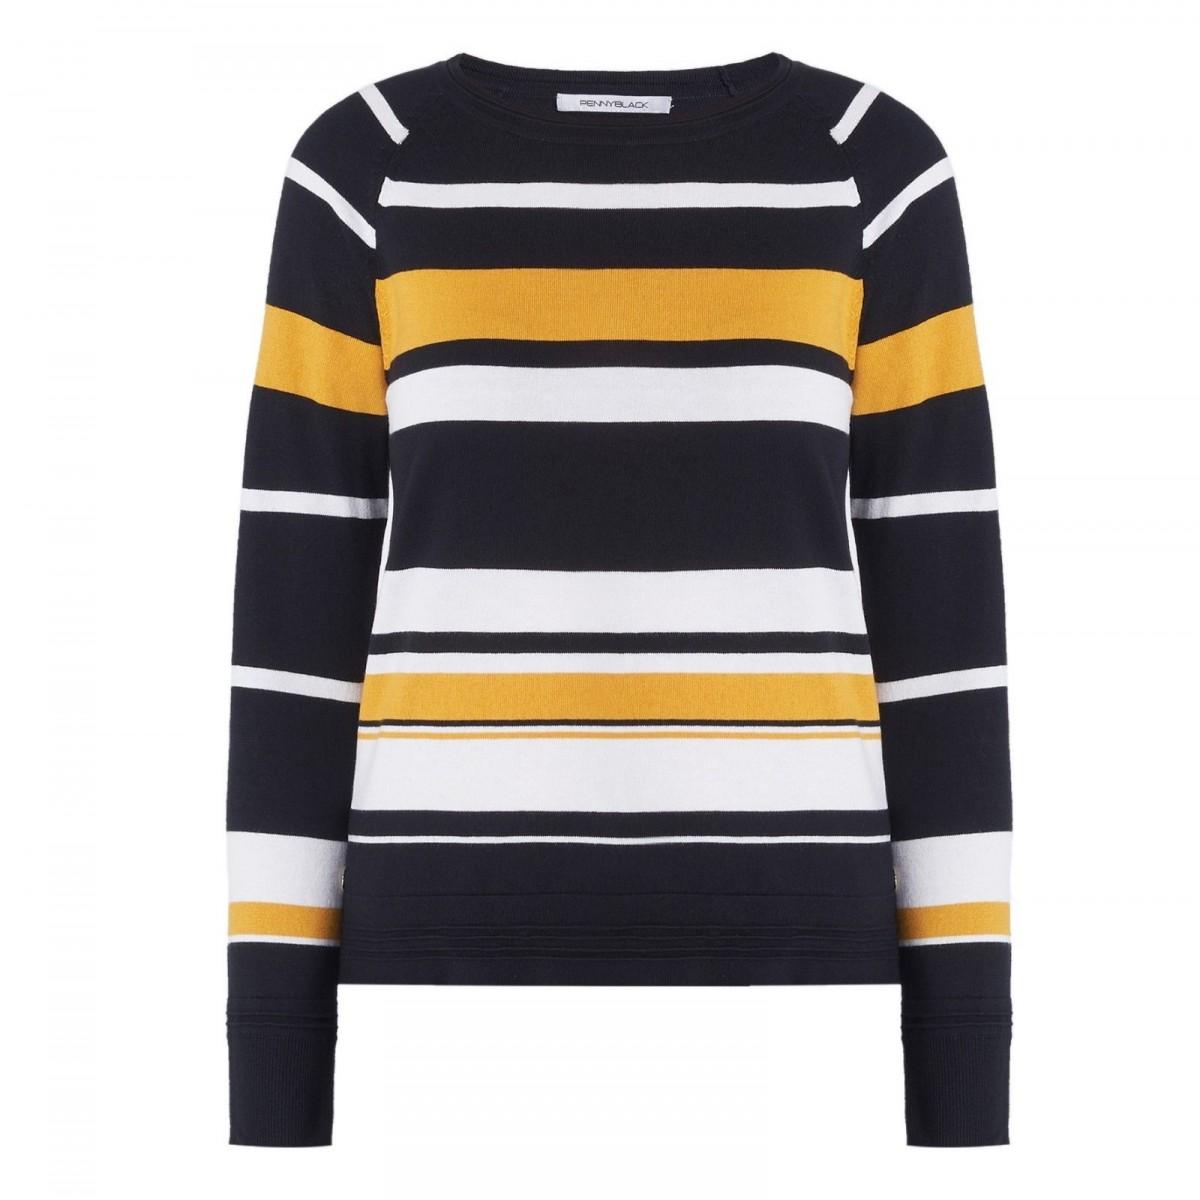 1daa32727bb3 PENNYBLACK woman sweater modal cotton silk slim fit mod OBOISTA